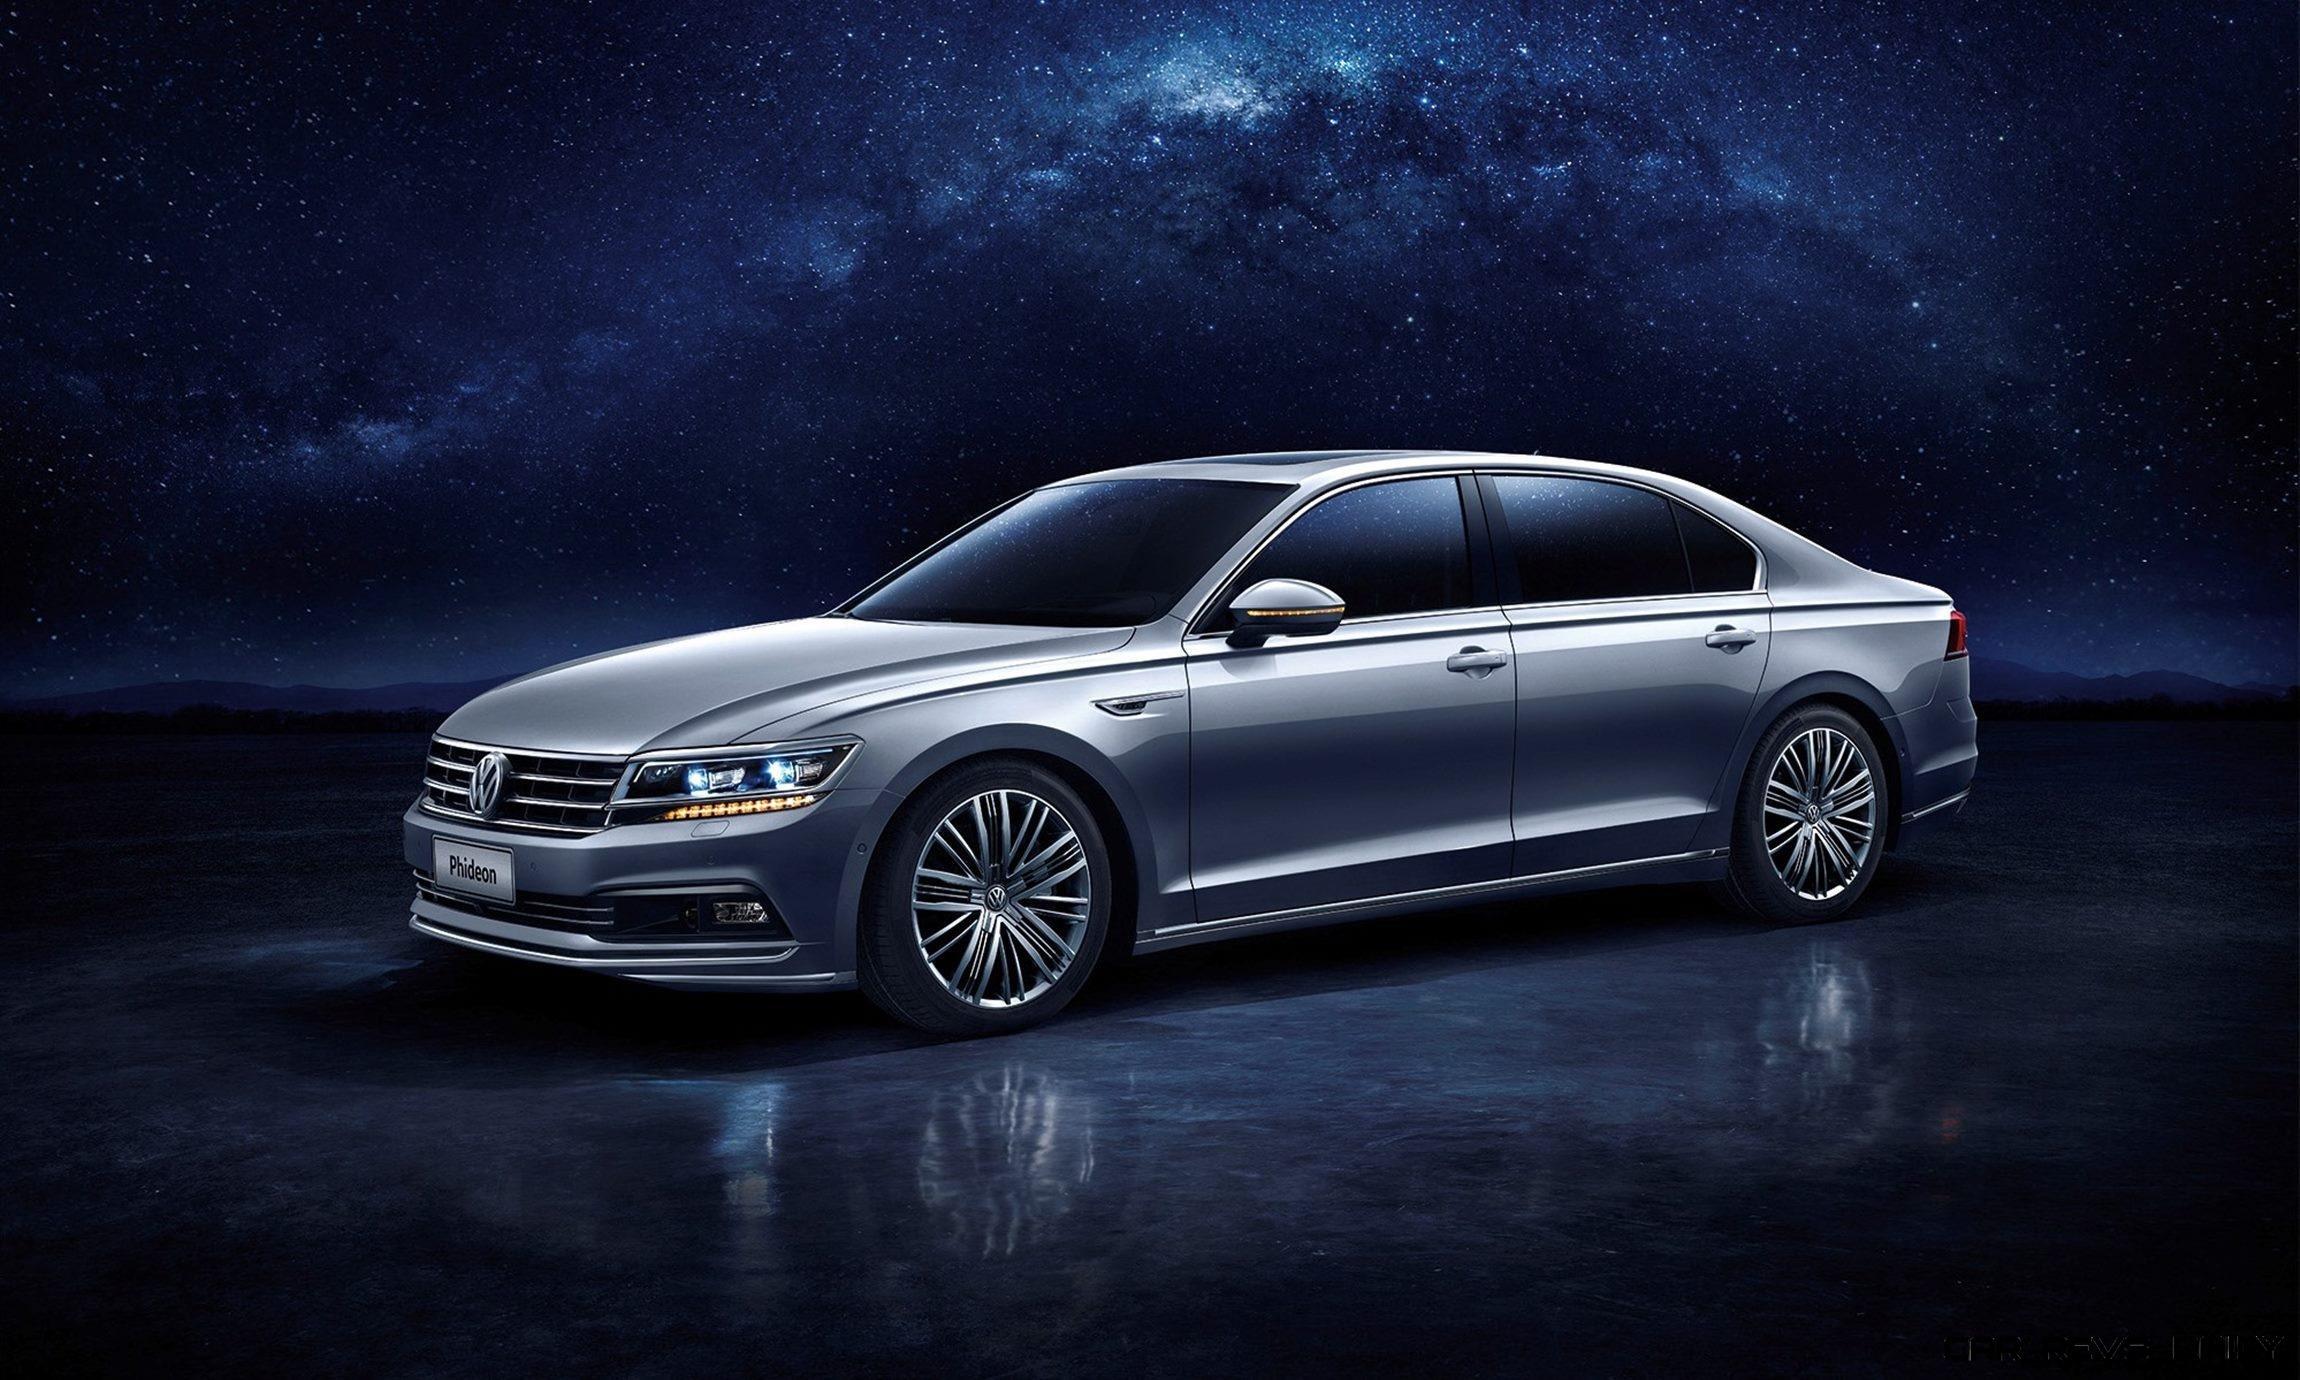 Genesis Coupe 2016 >> Geneva Debuts - 2016 SAIC Volkswagen PHIDEON - China-Only Super-Passat » Car-Revs-Daily.com